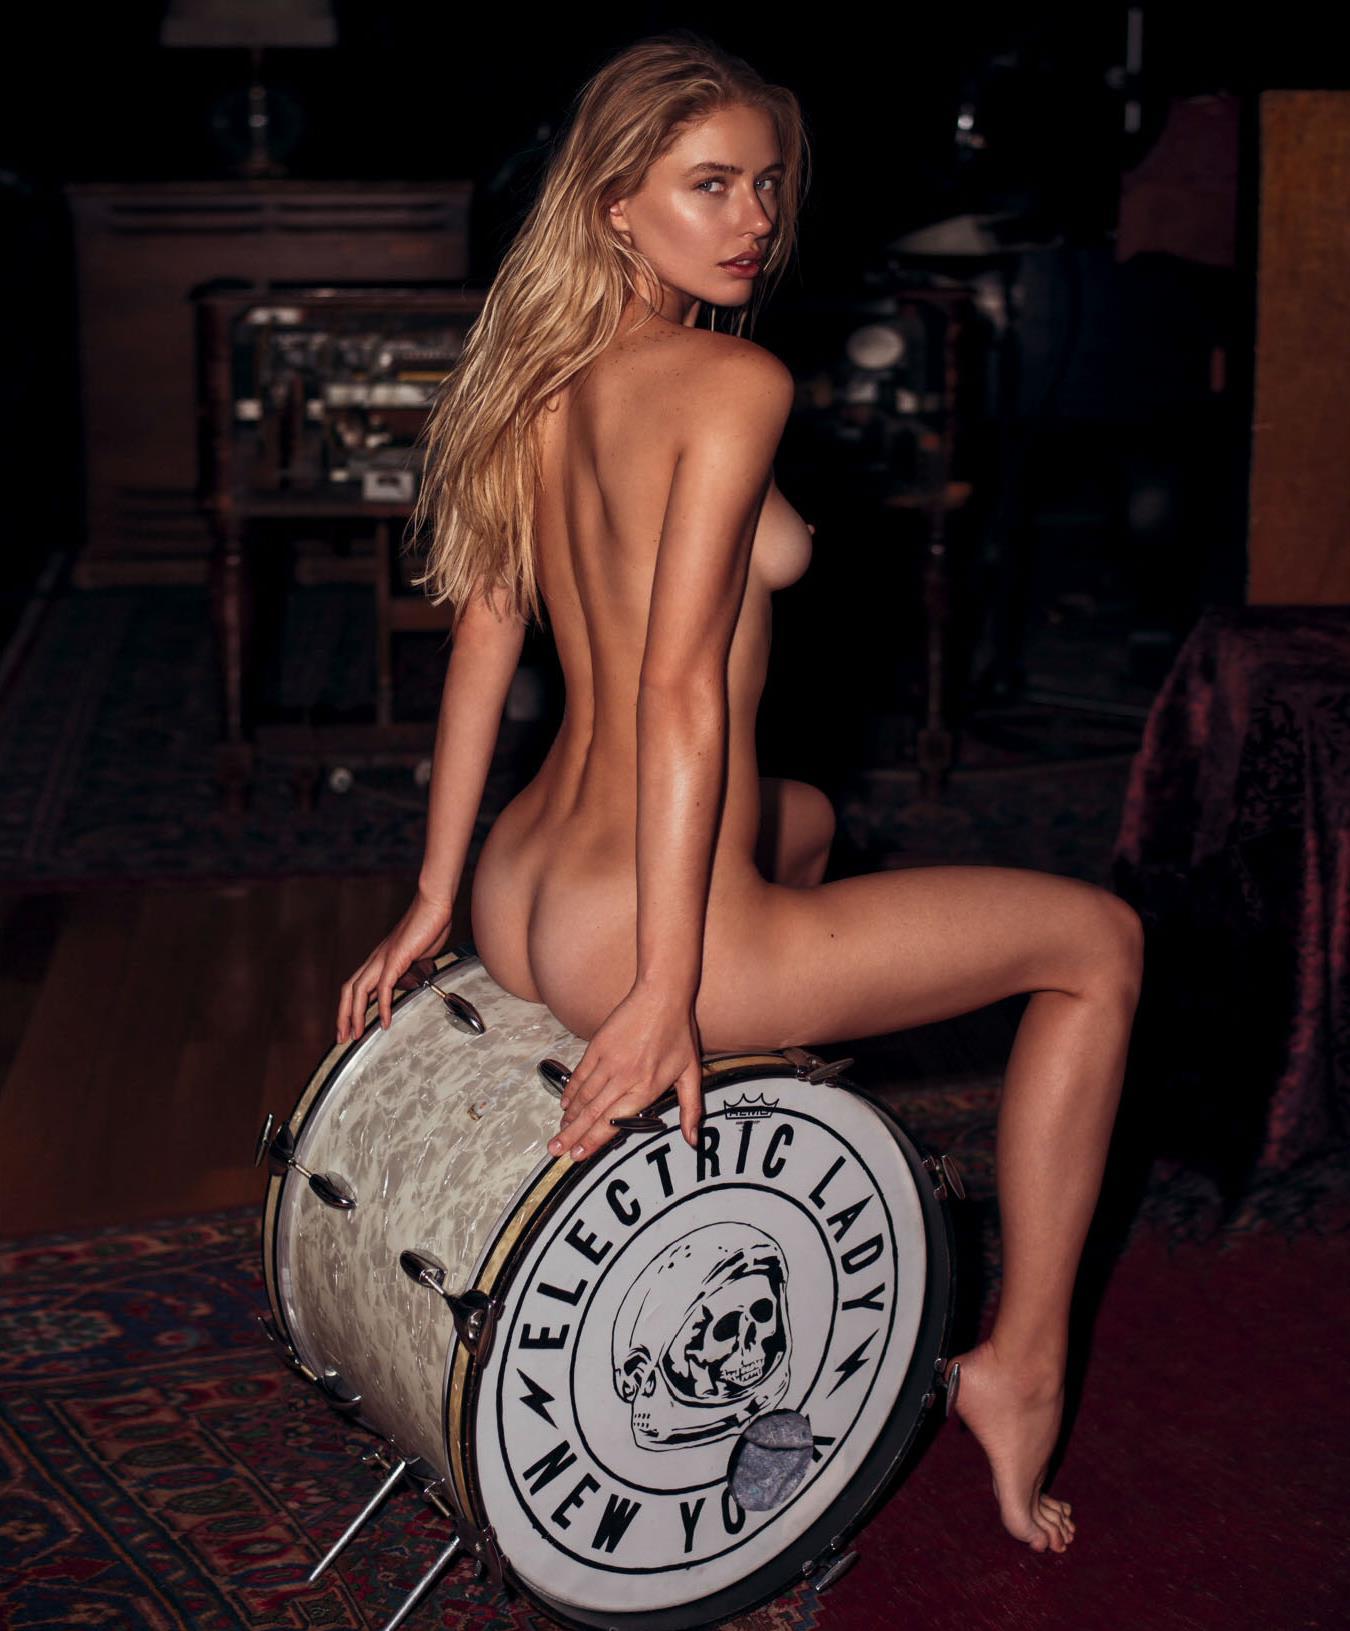 Daria Savishkina Tits nudes (99 photos), Sideboobs Celebrites photo